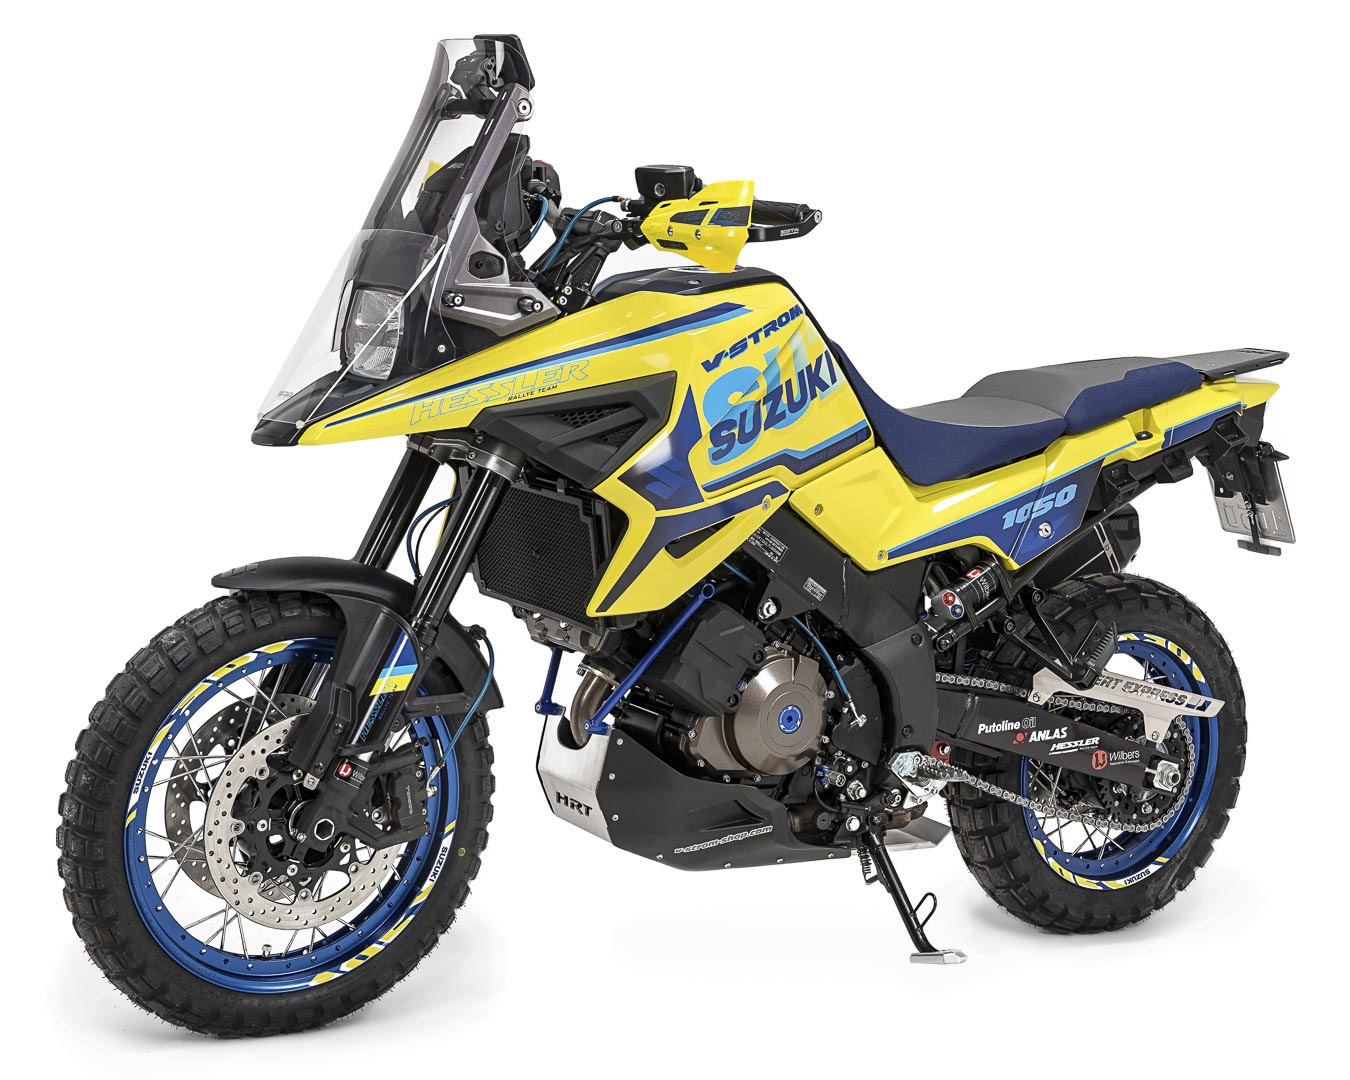 Modelspecific rear enlargement black for Suzuki V-Strom